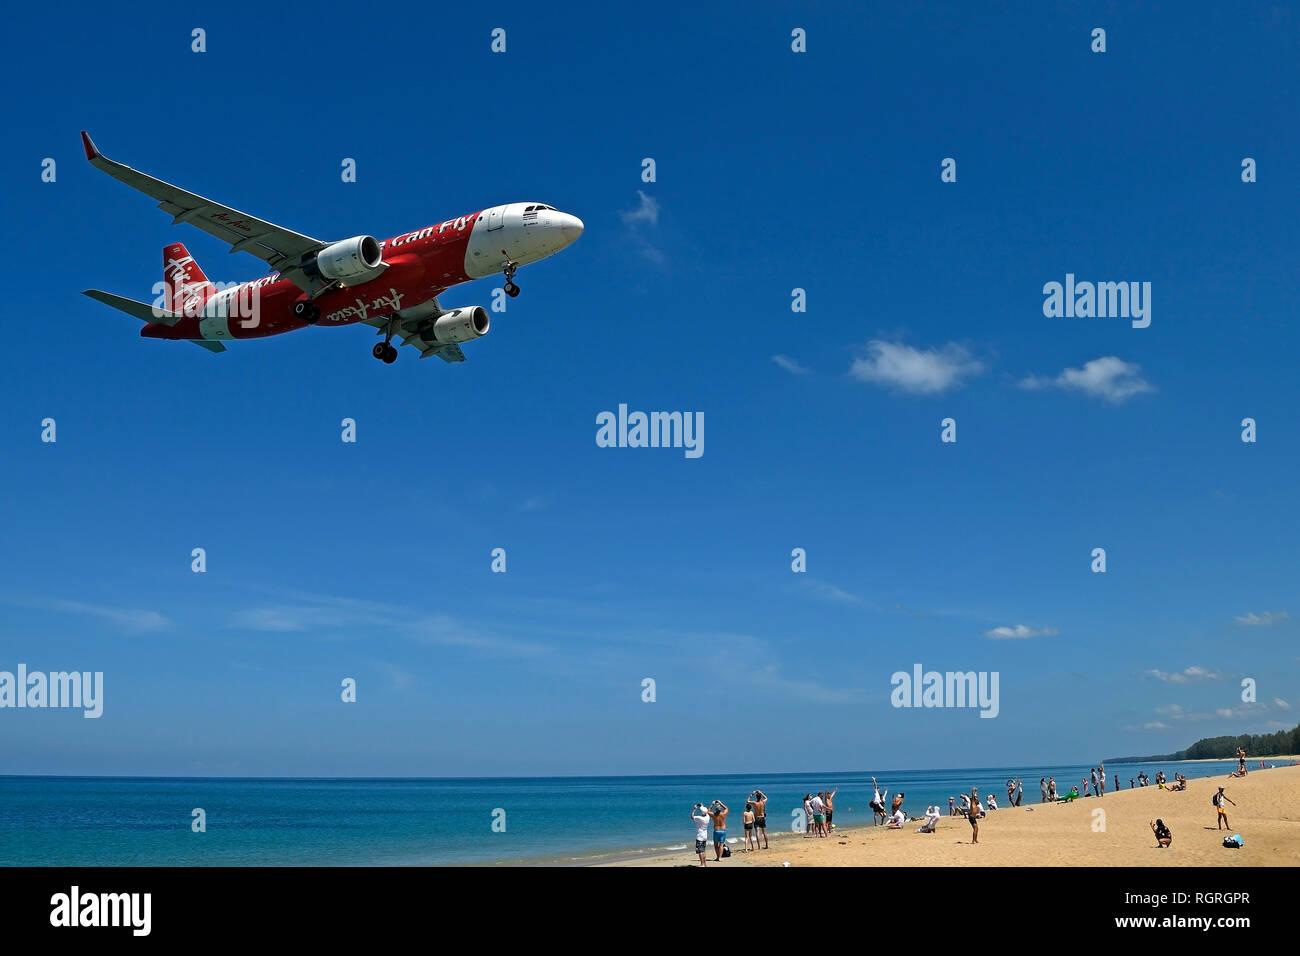 Flugzeug der Gesellschaft Air Asia, Landeanflug, Mai Kao Beach, Phuket, Thailand Stock Photo